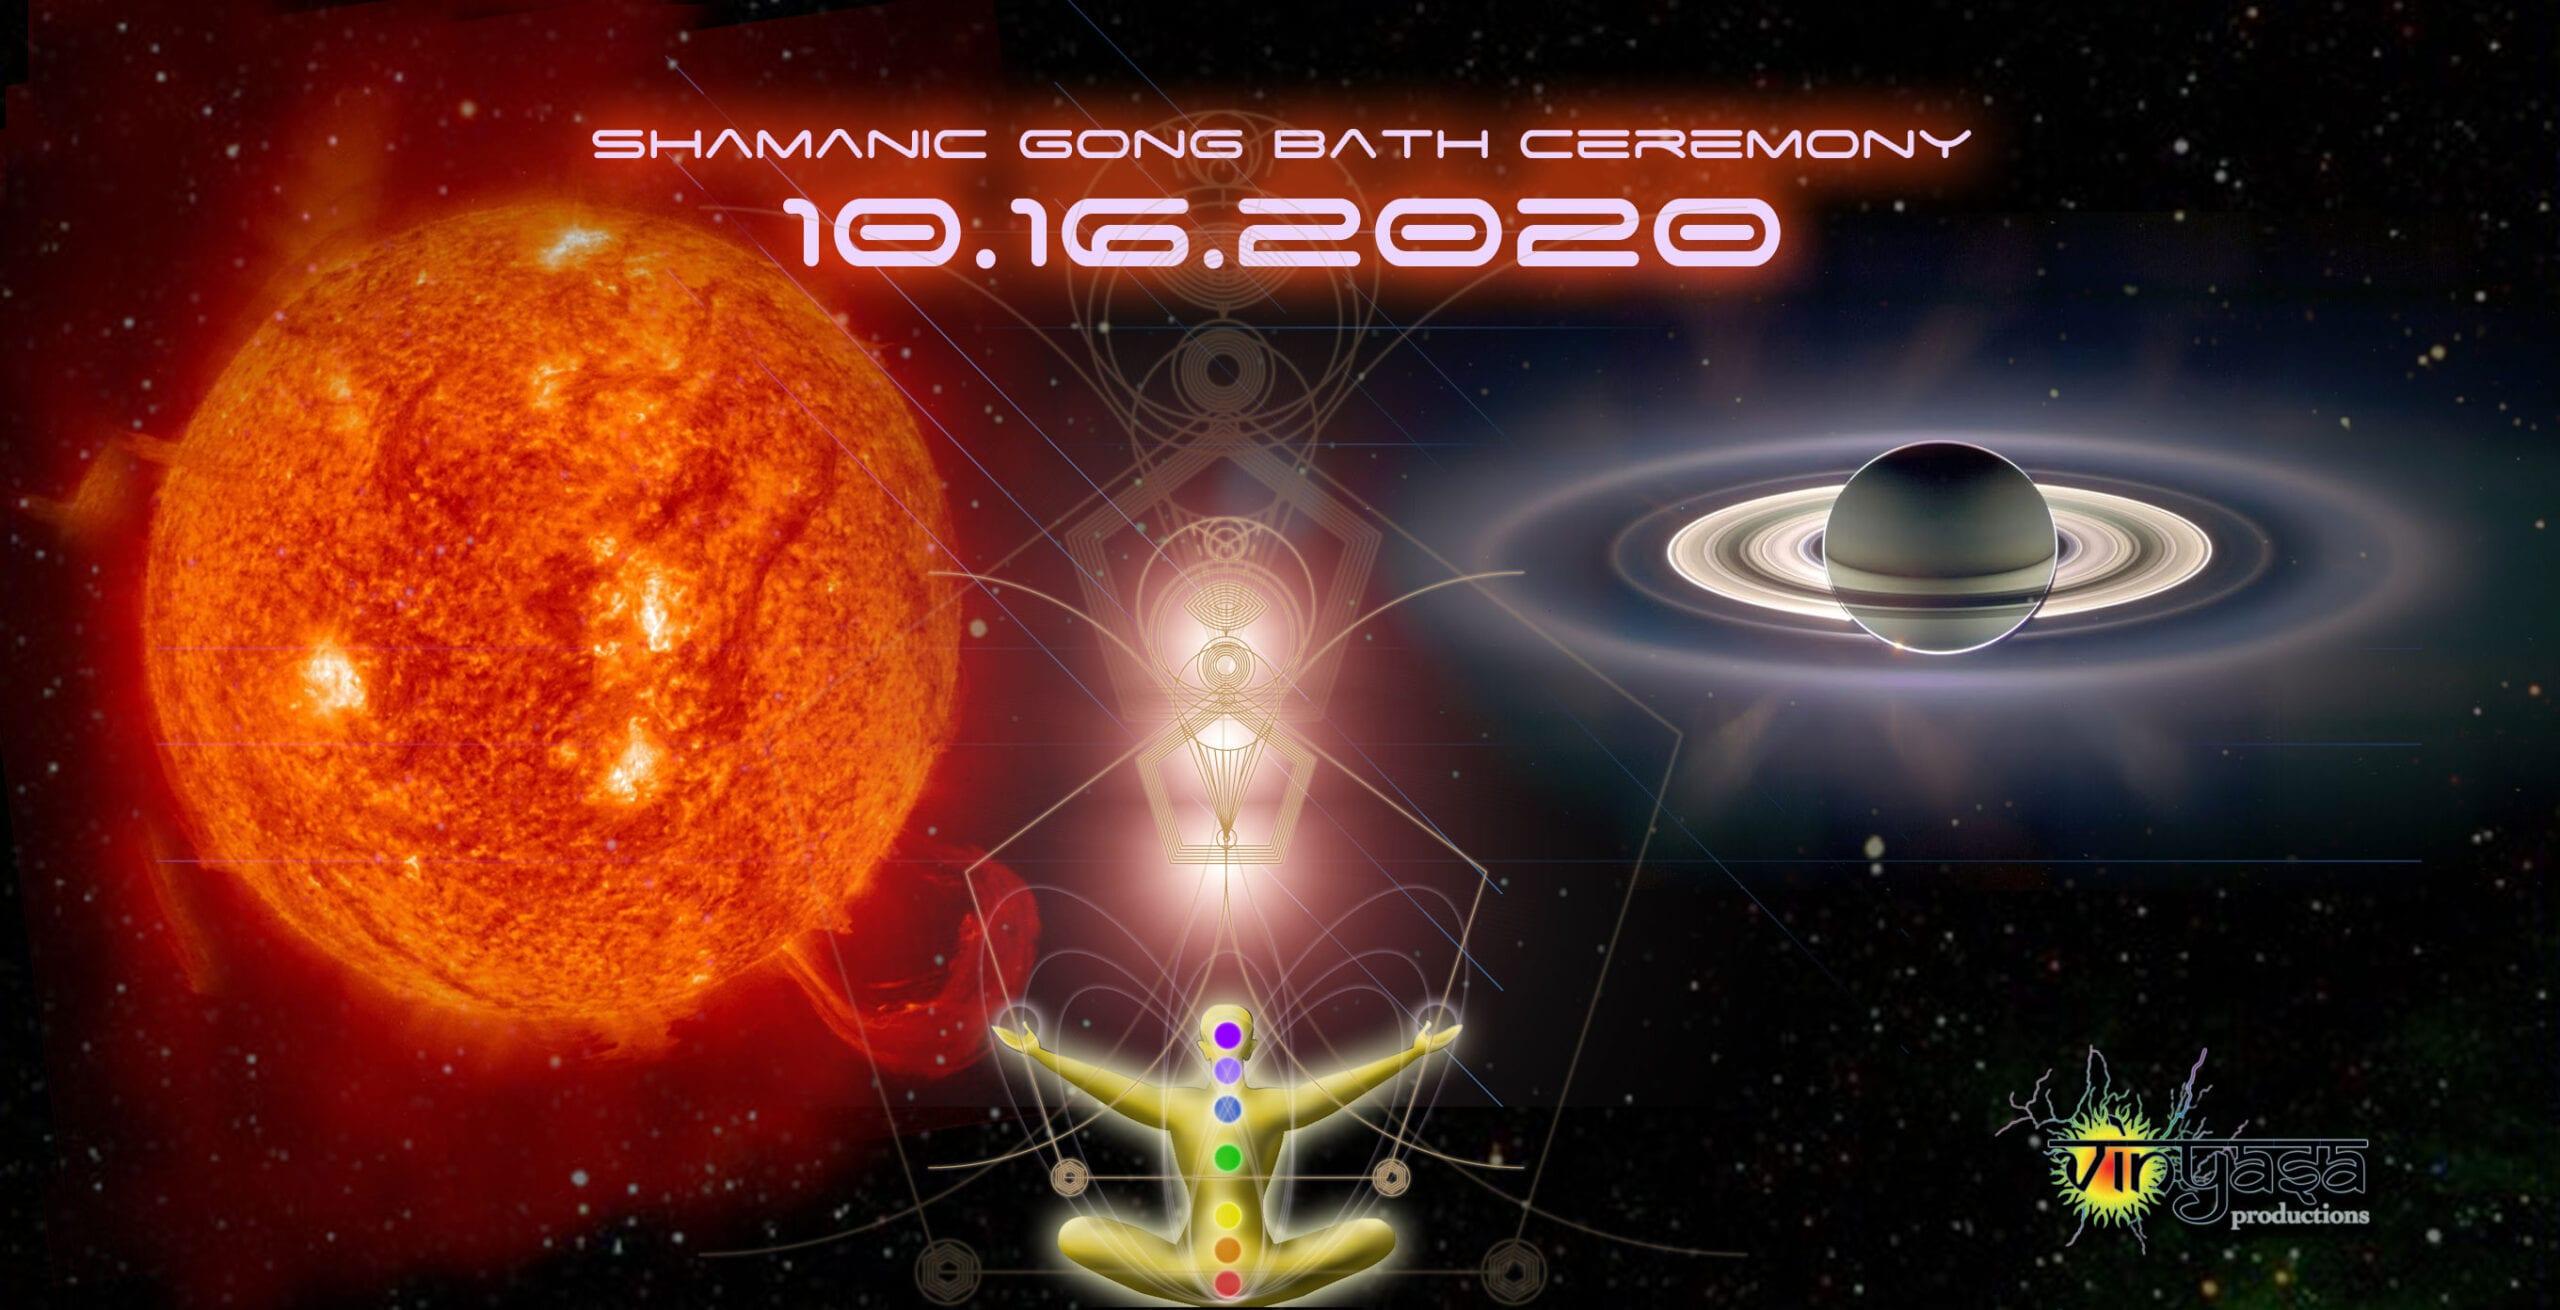 October 15, 2020 Gong Bath